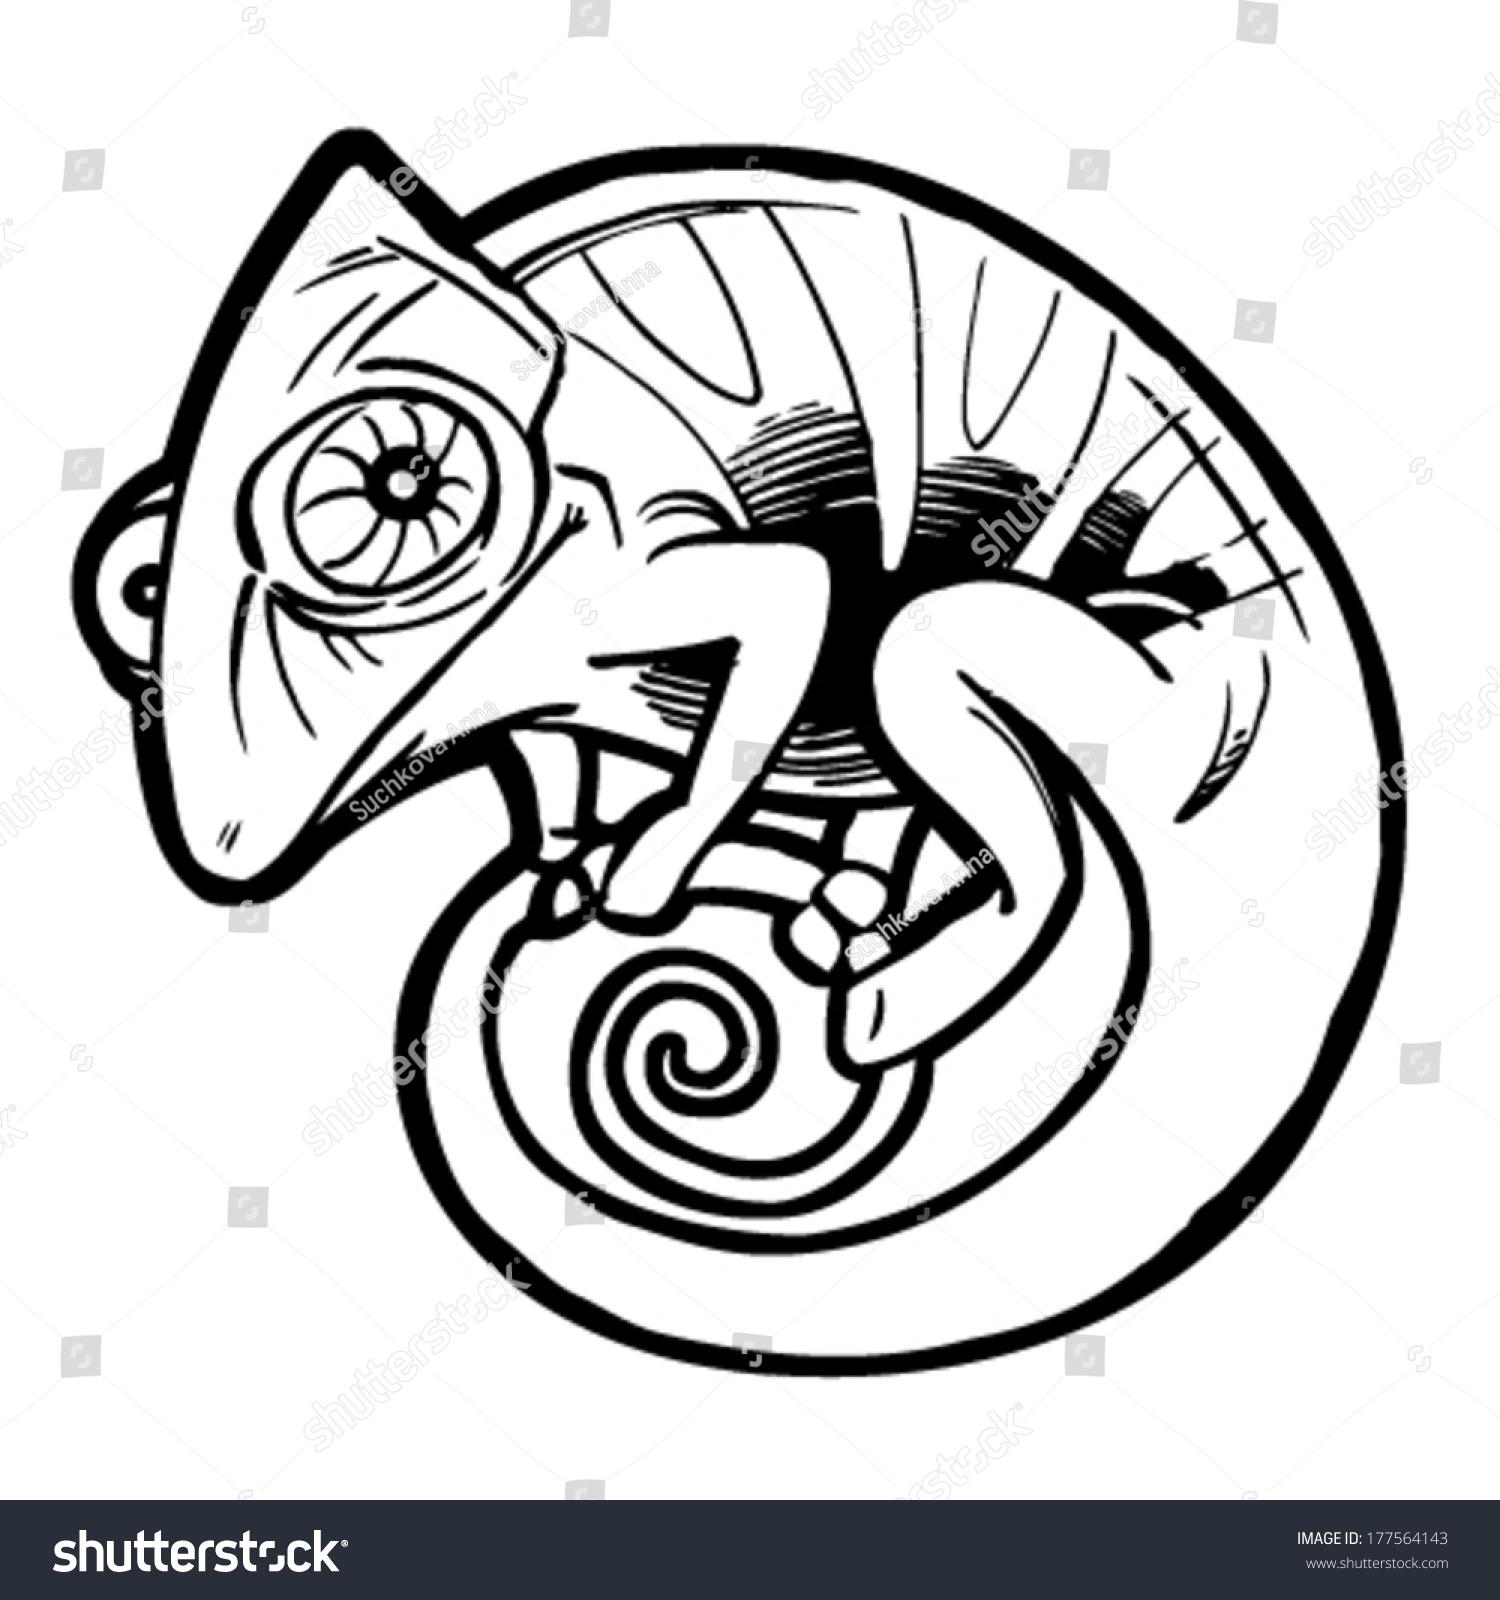 Chameleon Tattoo Designs Drawings: Chameleon Tattoo Black Stylized Cartoon Cute Stock Vector